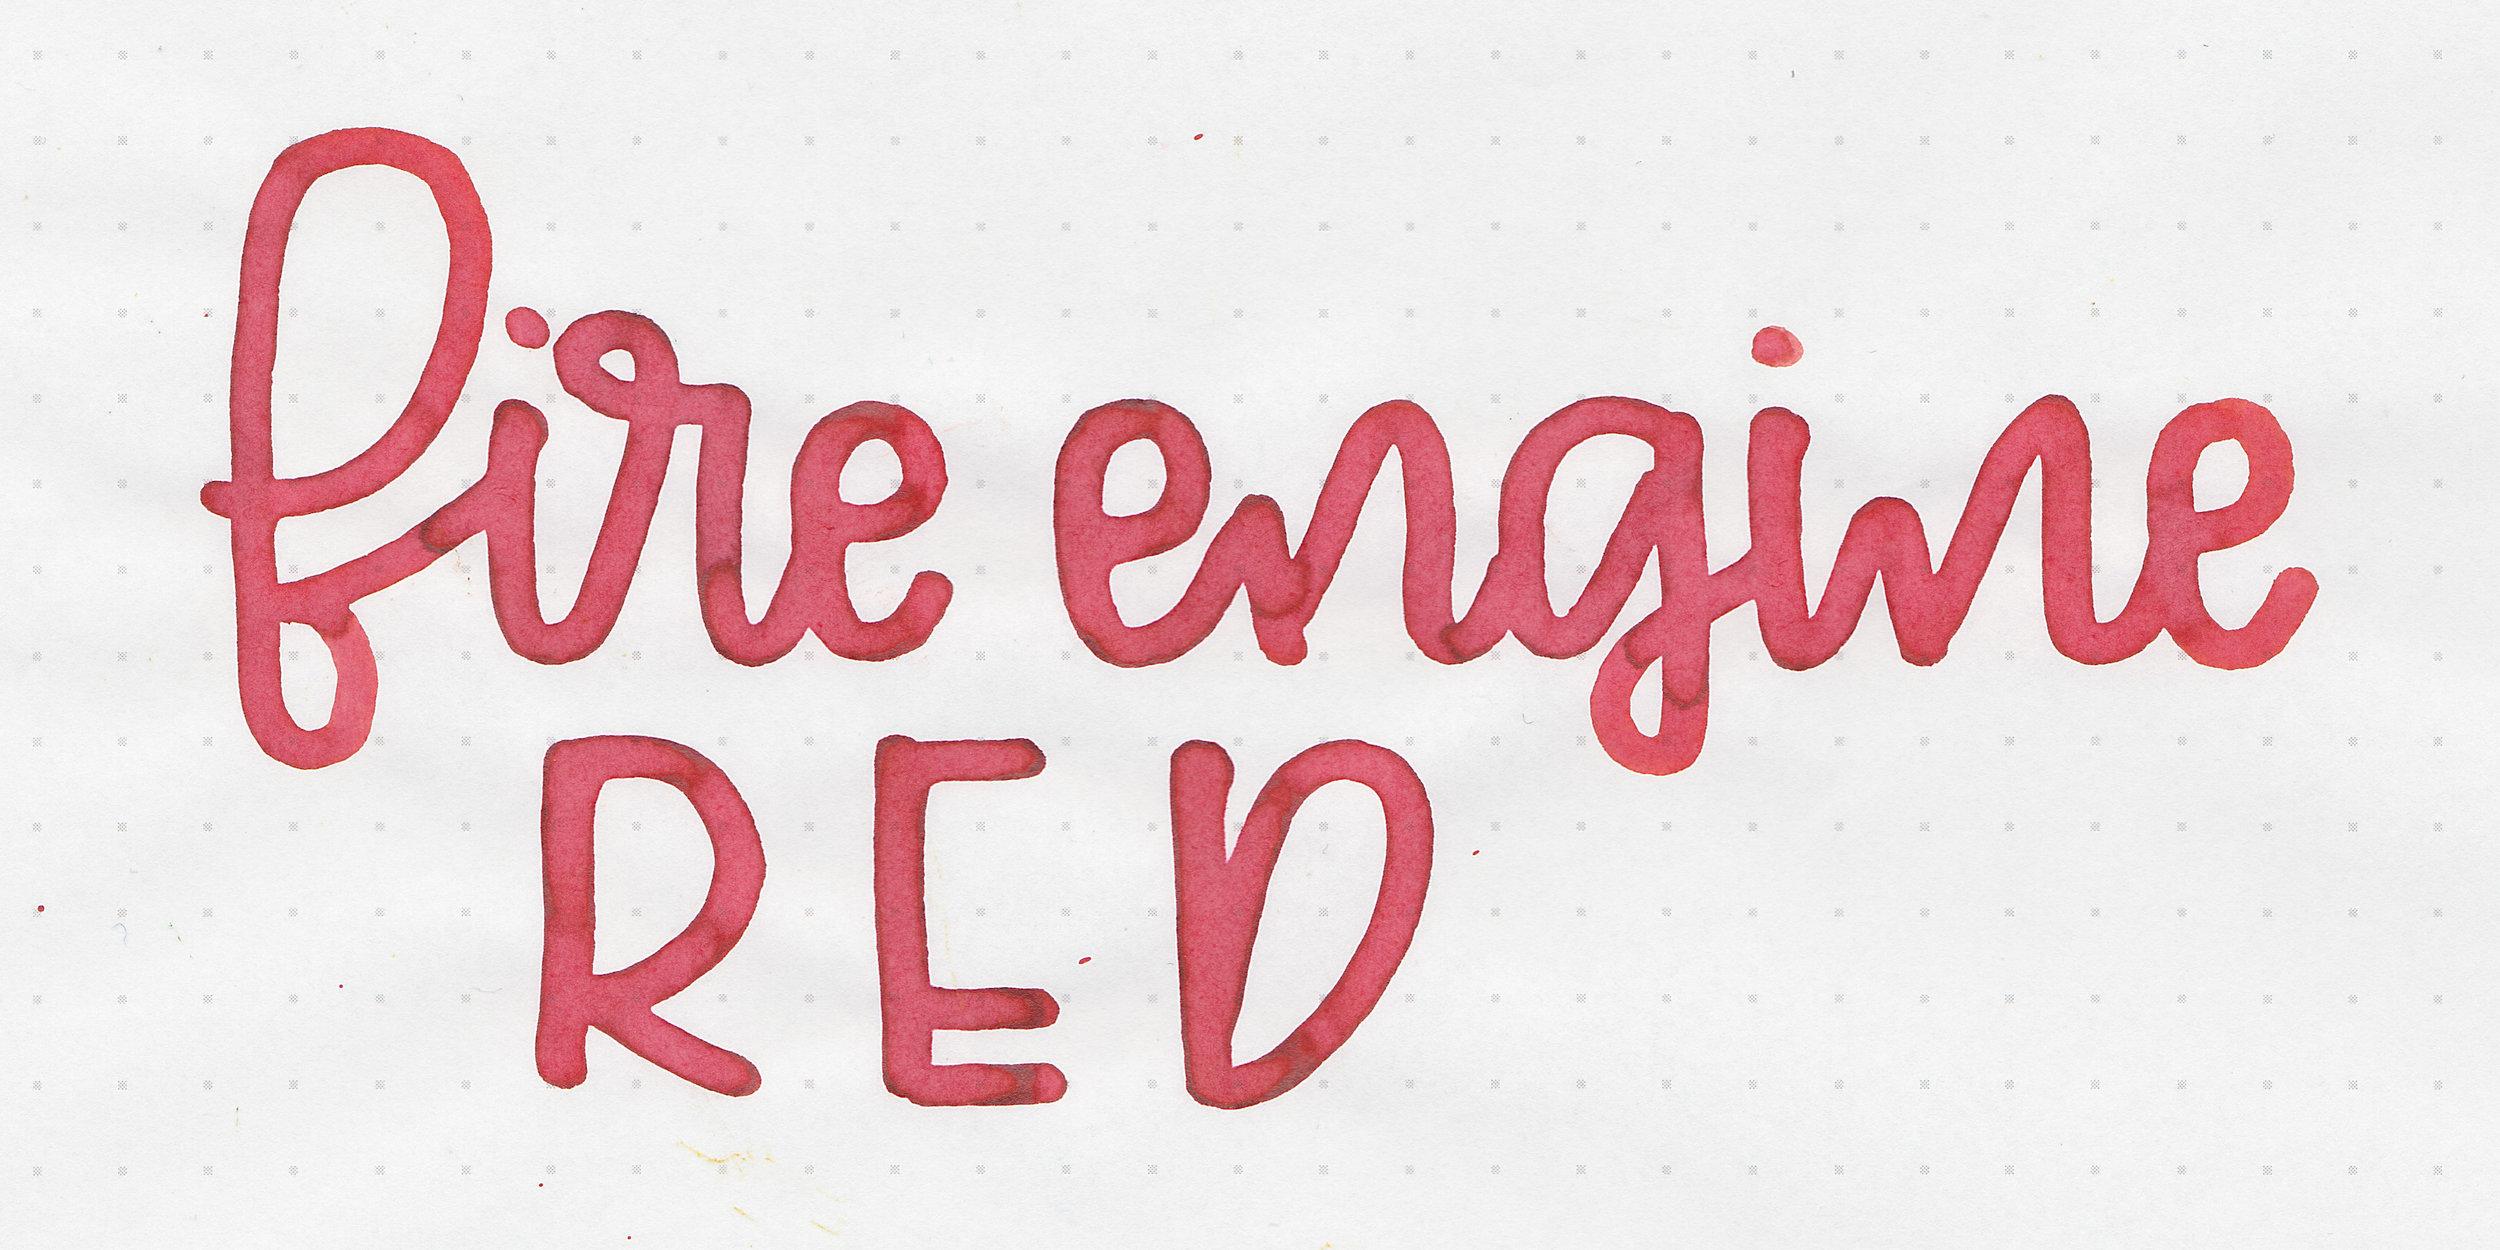 ro-fire-engine-red-5.jpg